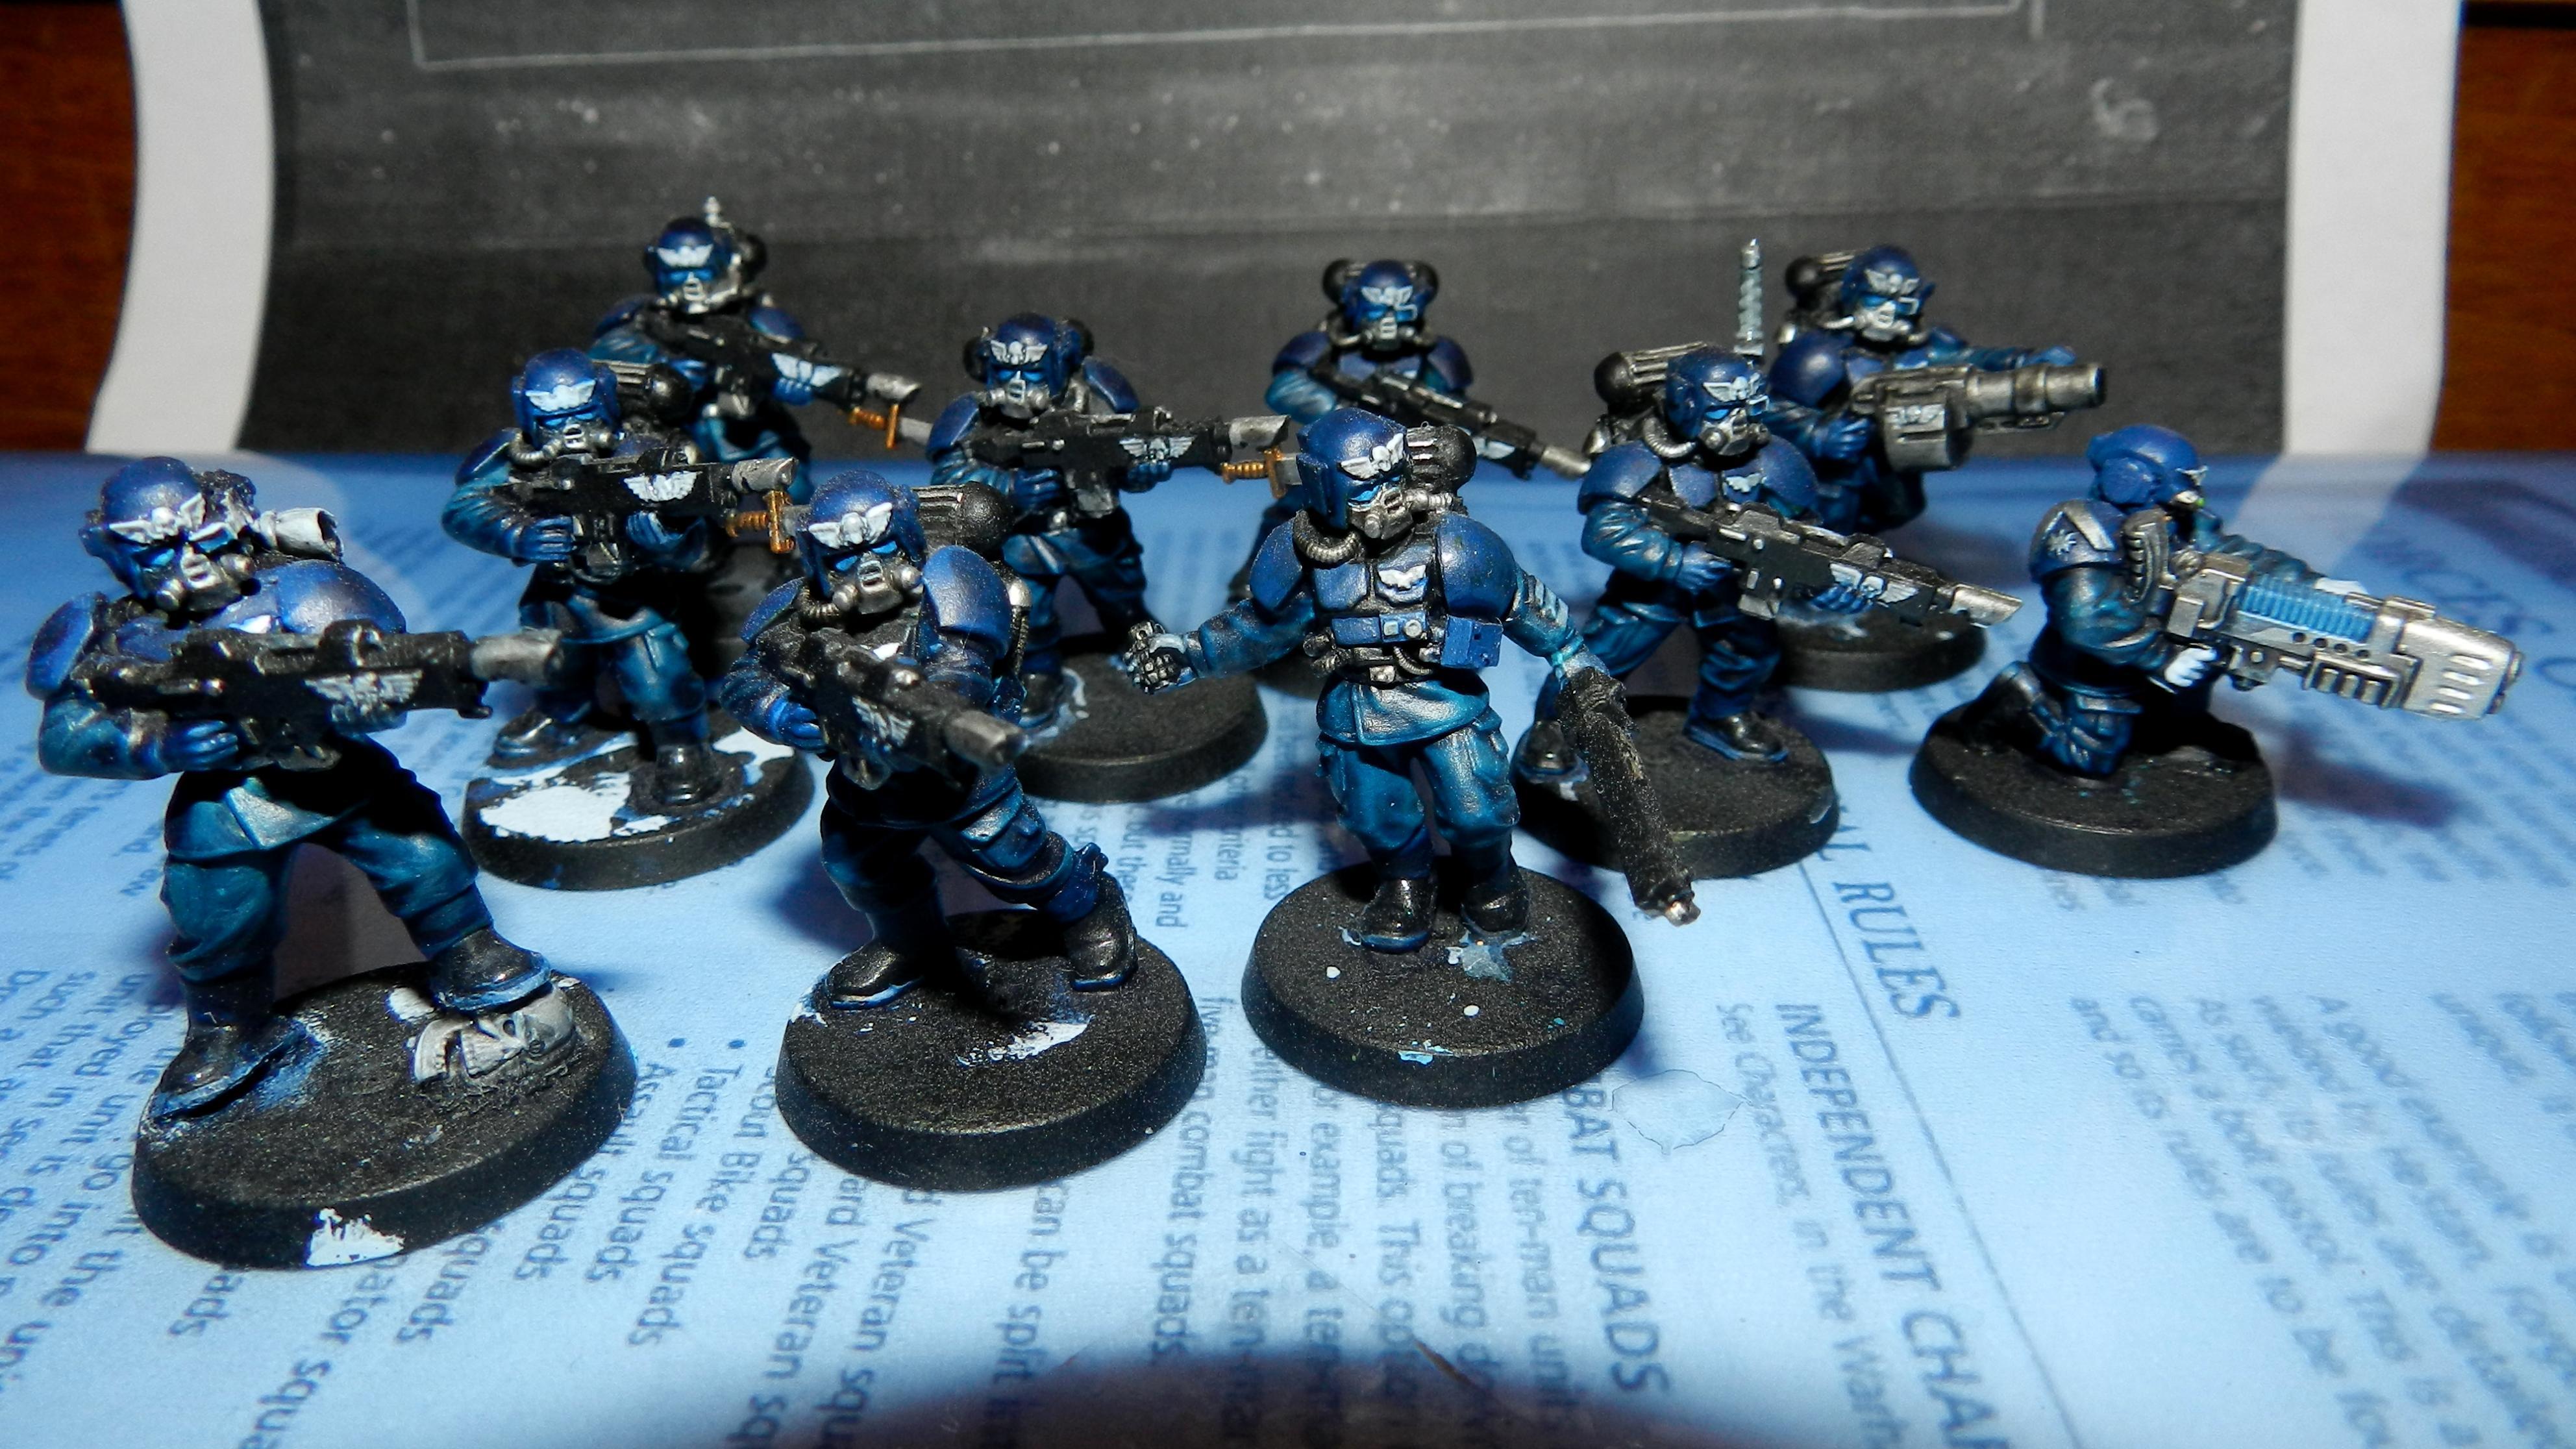 Adeptus Arbites, Cadians, Conversion, Gears Of War, Grenadier, Grenadiers, Guardsmen, Imperial Guard, Plasma Gun, Warhammer 40,000, Work In Progress